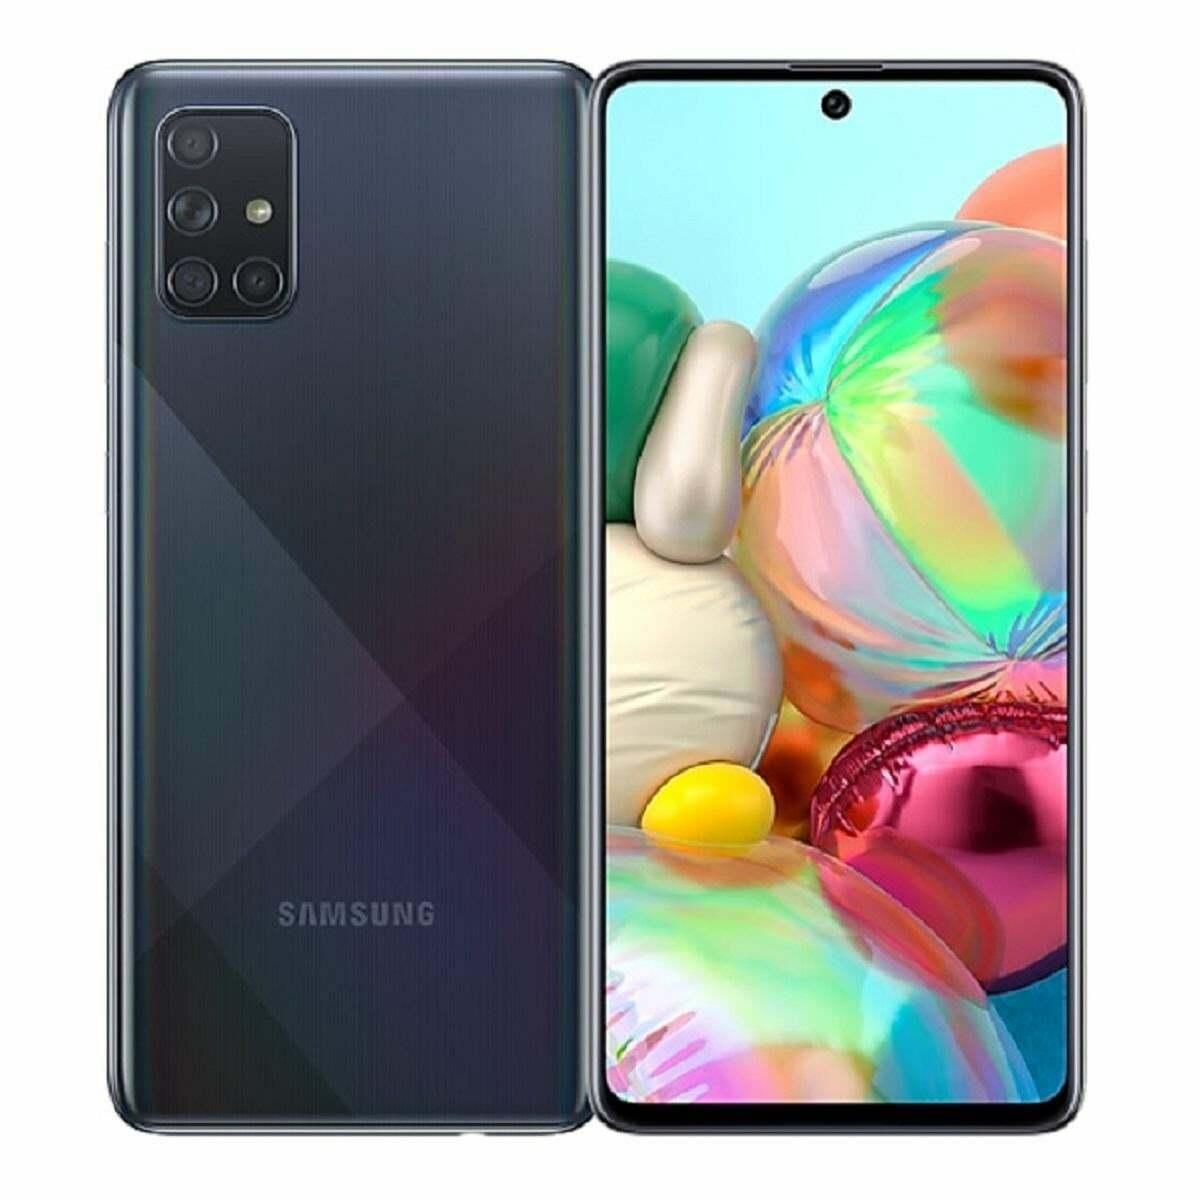 Android Phone - Samsung Galaxy A71 SM-A715F/DS - 128GB - Prism Crush Black (Unlocked) (Dual SIM)